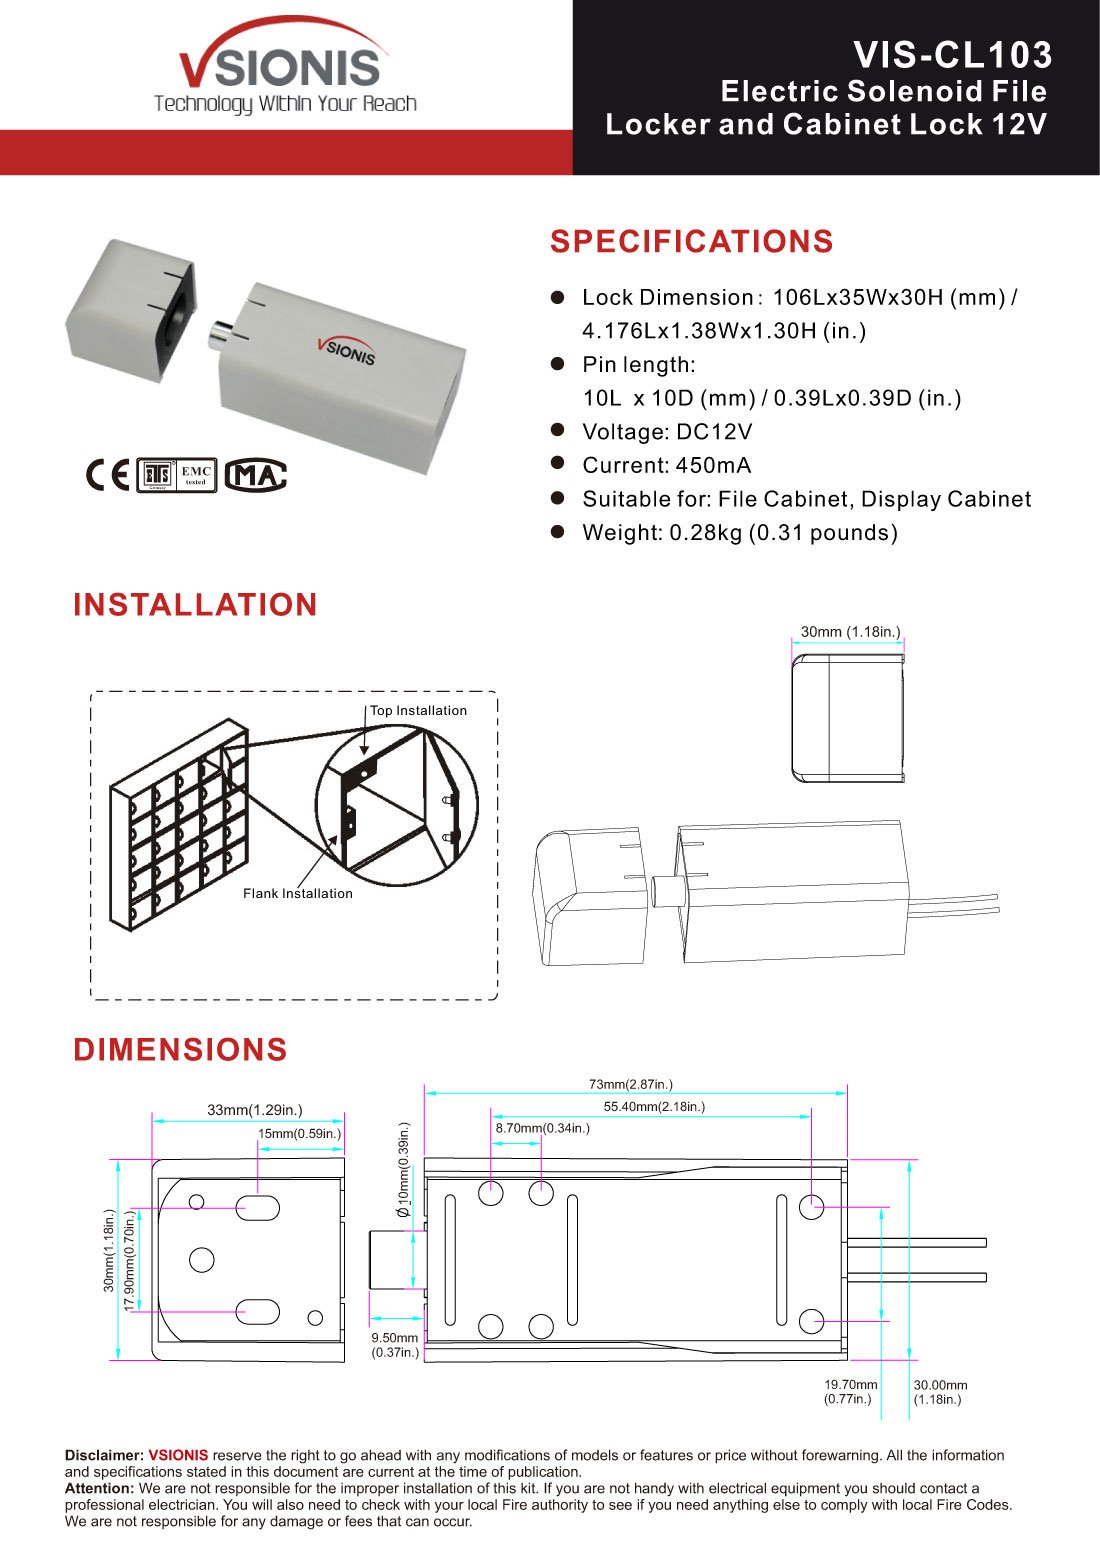 Visionis VIS-CL-103 Electric Solenoid File Locker and Cabinet Lock 12v